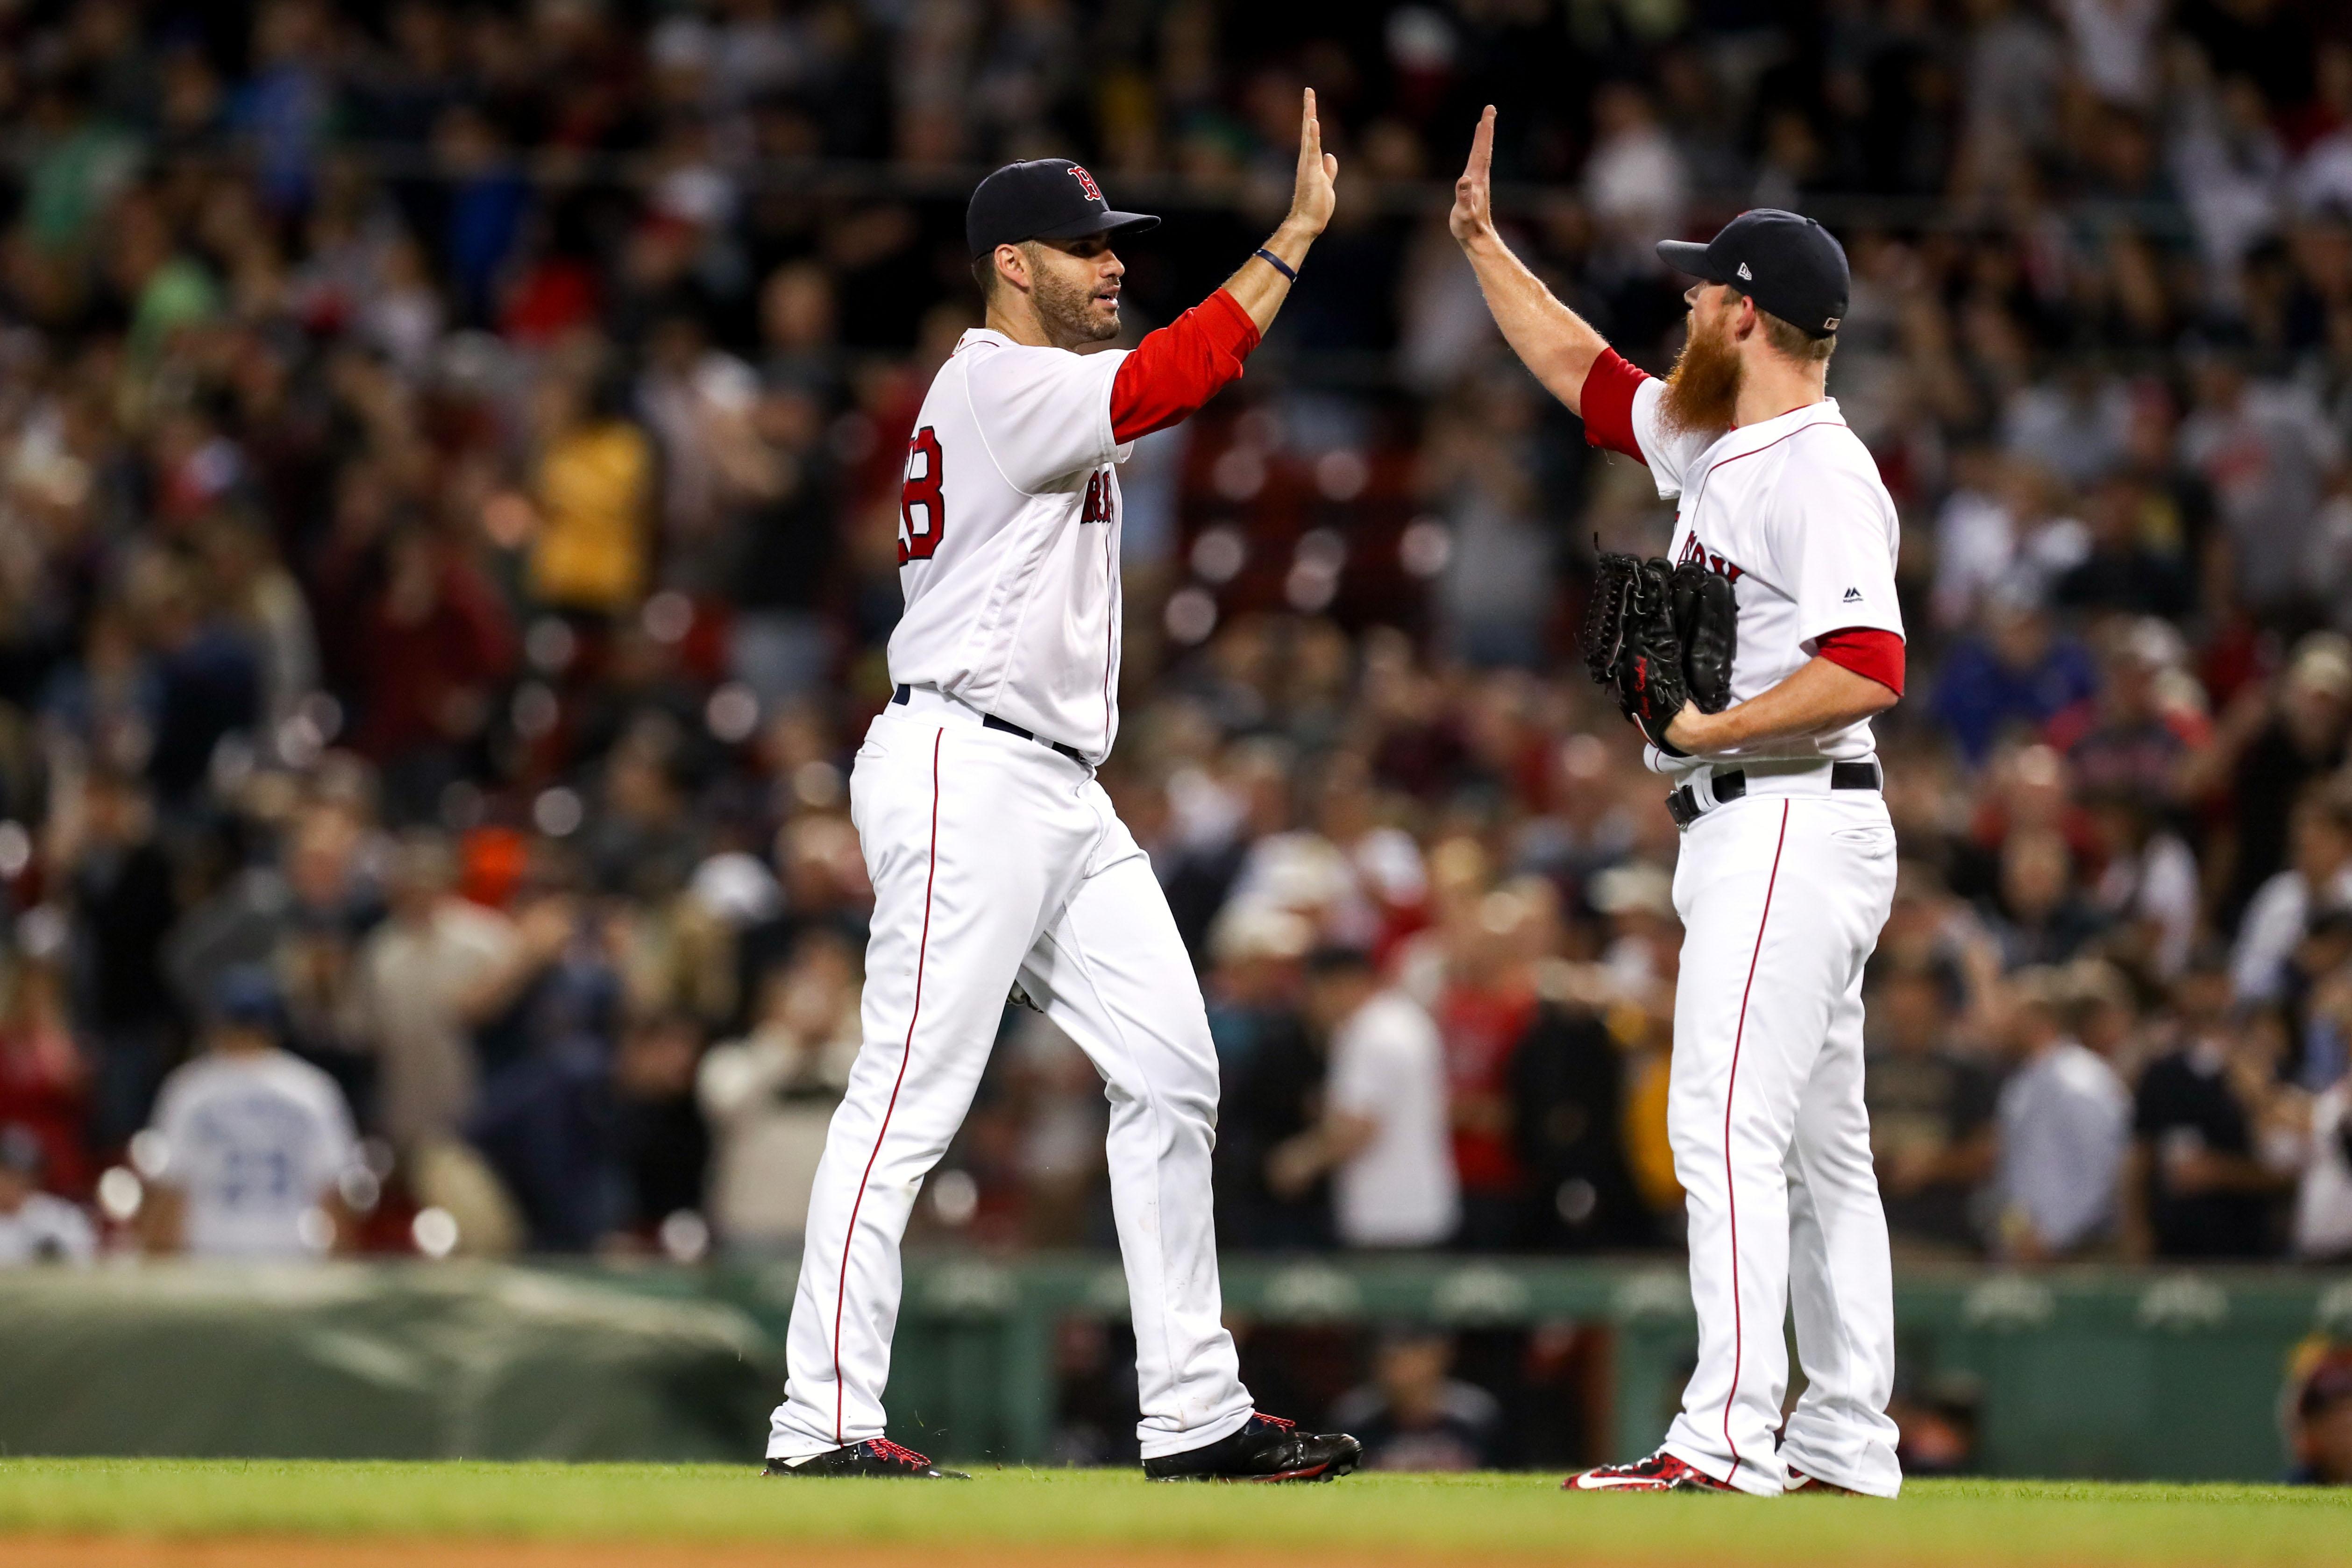 MLB: Toronto Blue Jays at Boston Red Sox